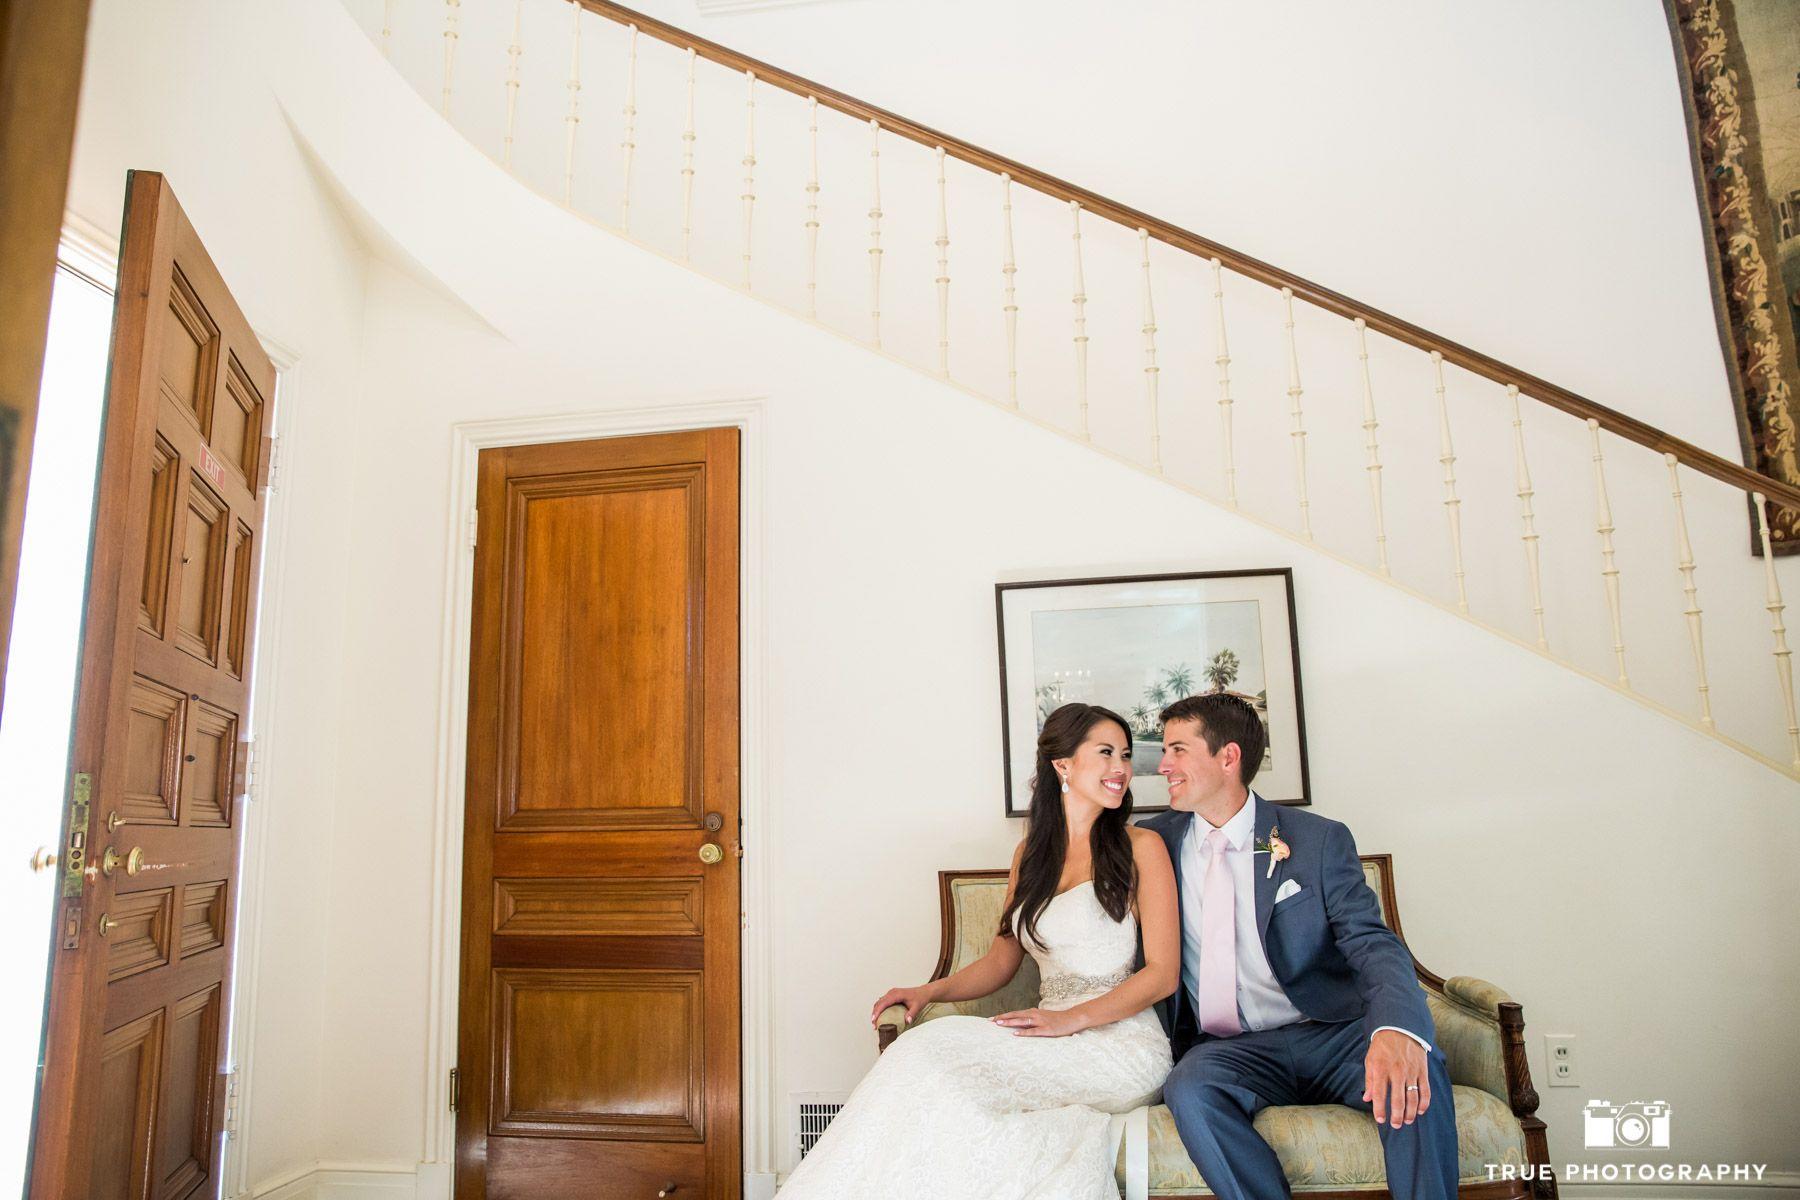 019M_D #weddingphotography / national wedding photographers